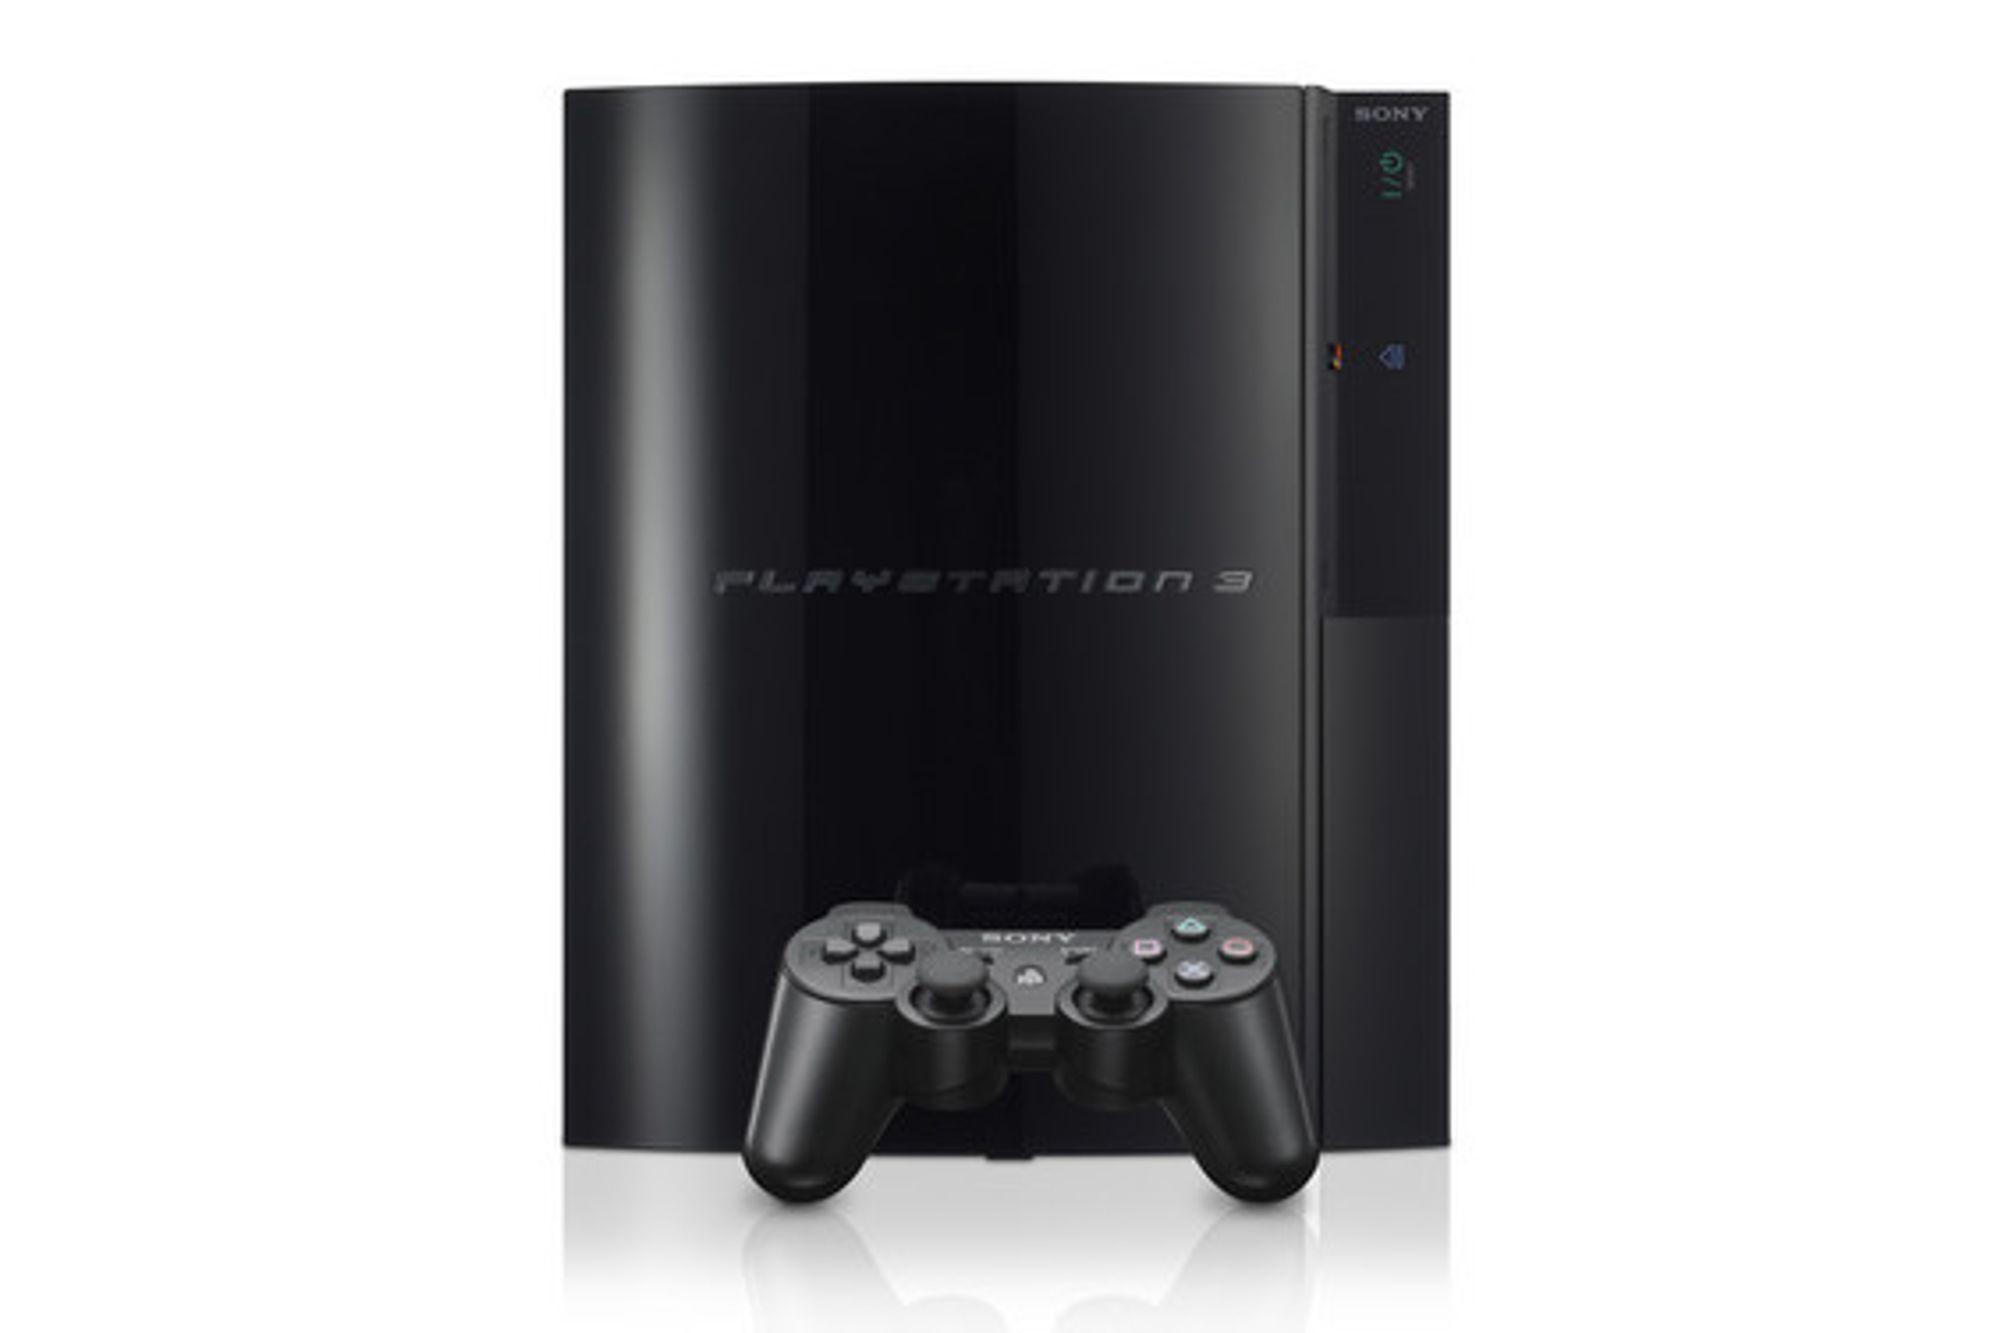 Playstation 3 kan kjøre Linux